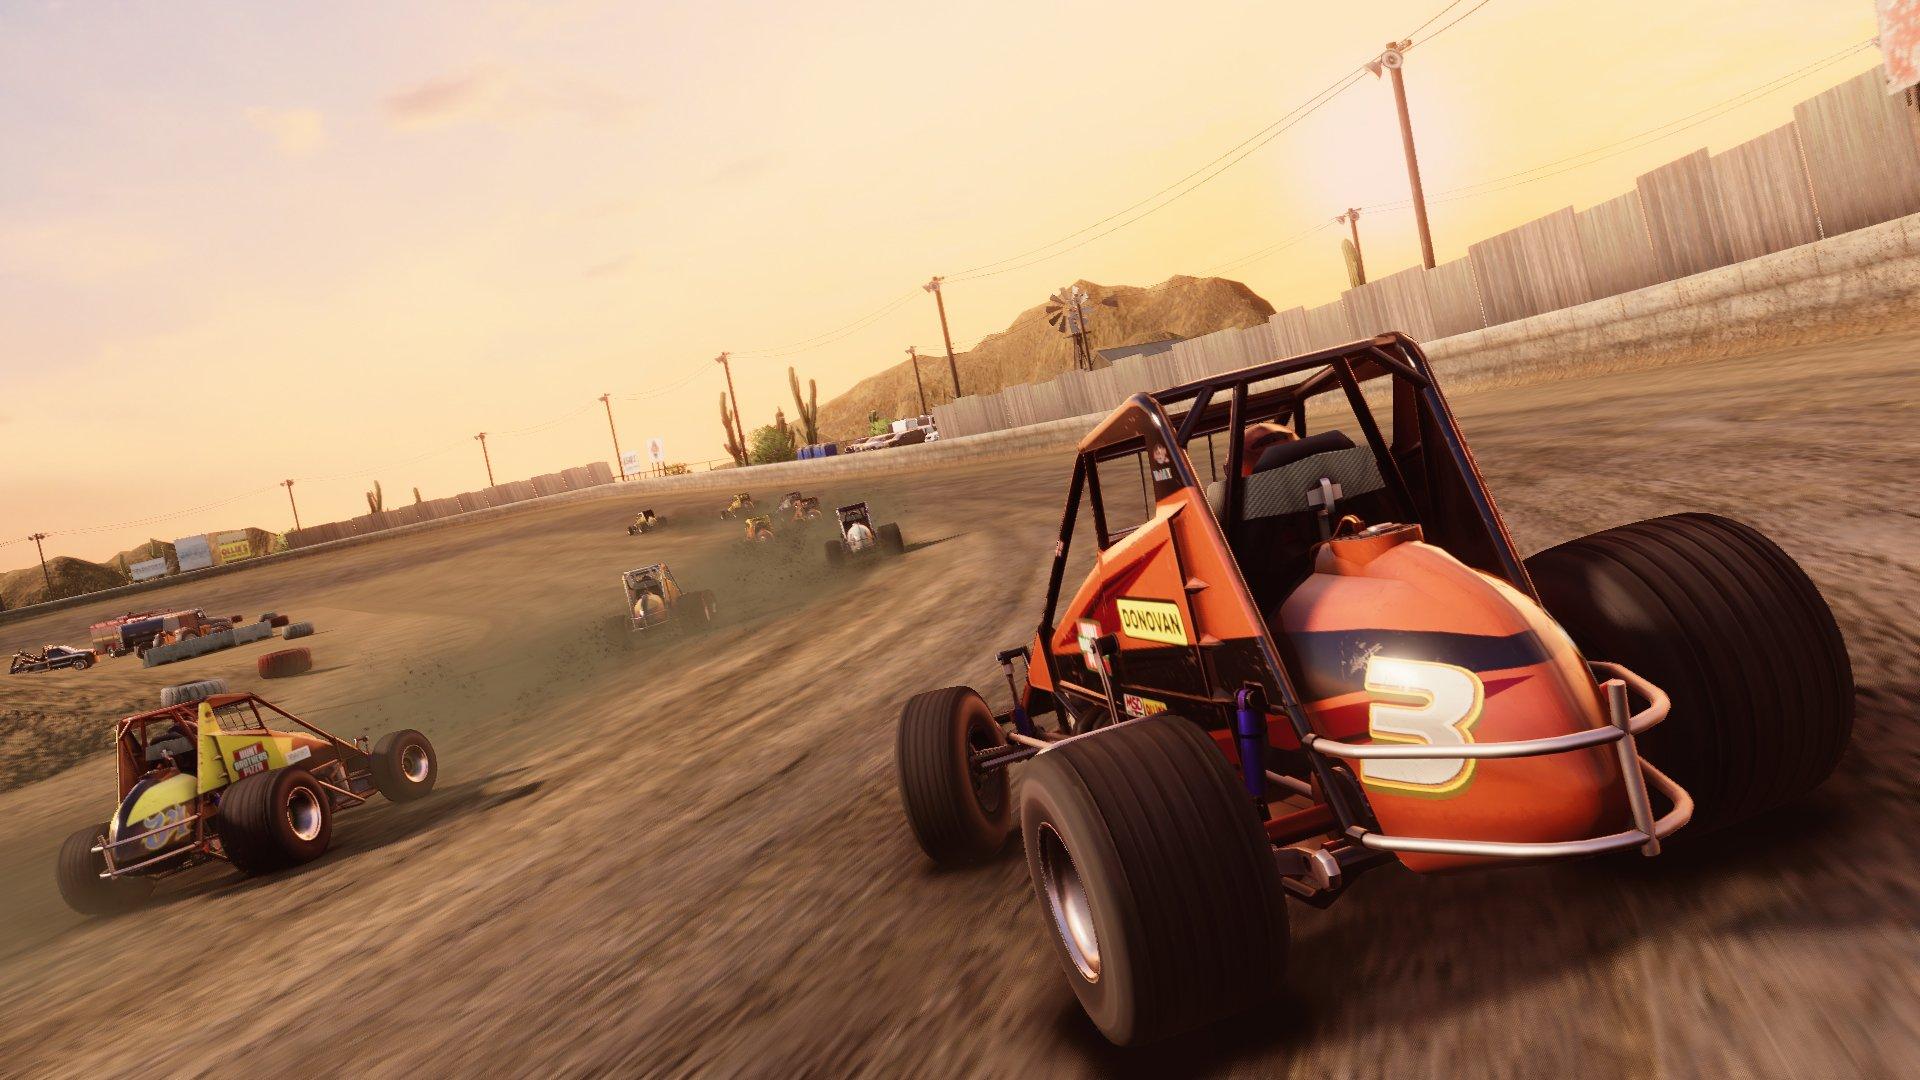 Dirt midget video game - screenshot